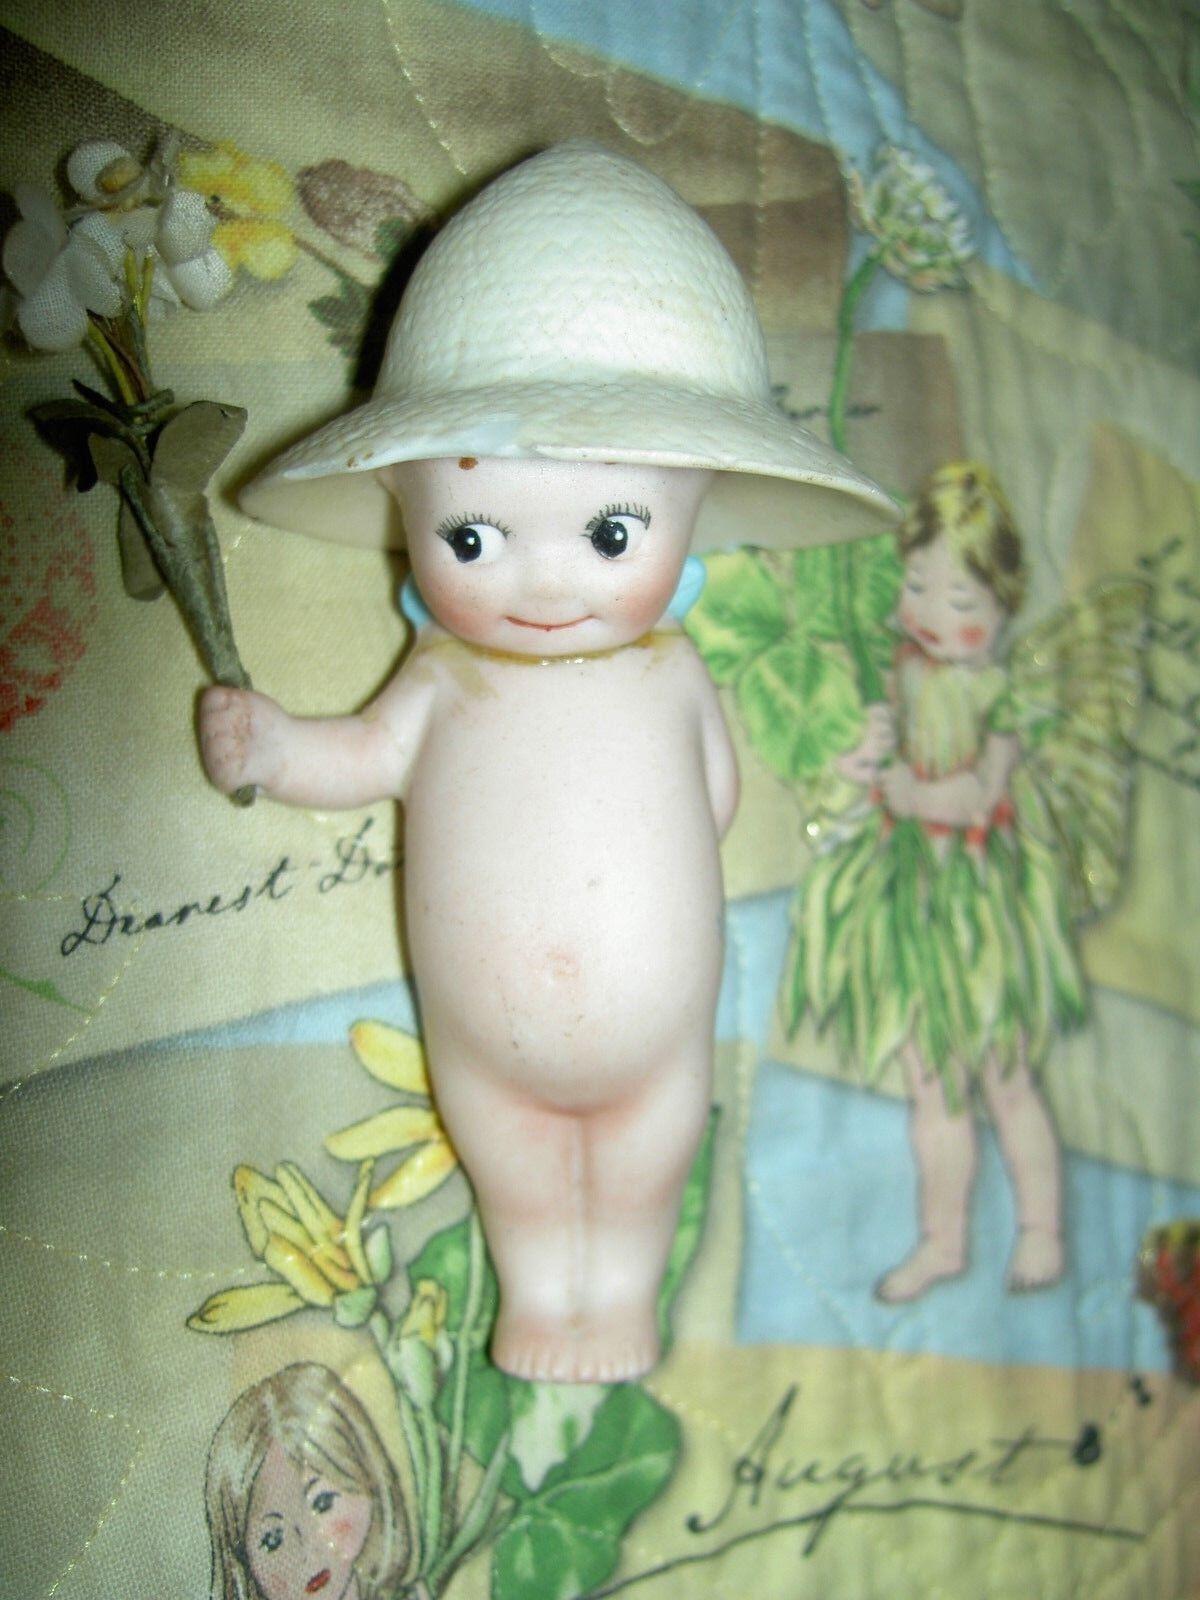 Raro Antiguo Alemán todos Bisque, rosado O 'Neill Kewpie jardinegro Figura Muñeco  tal cual